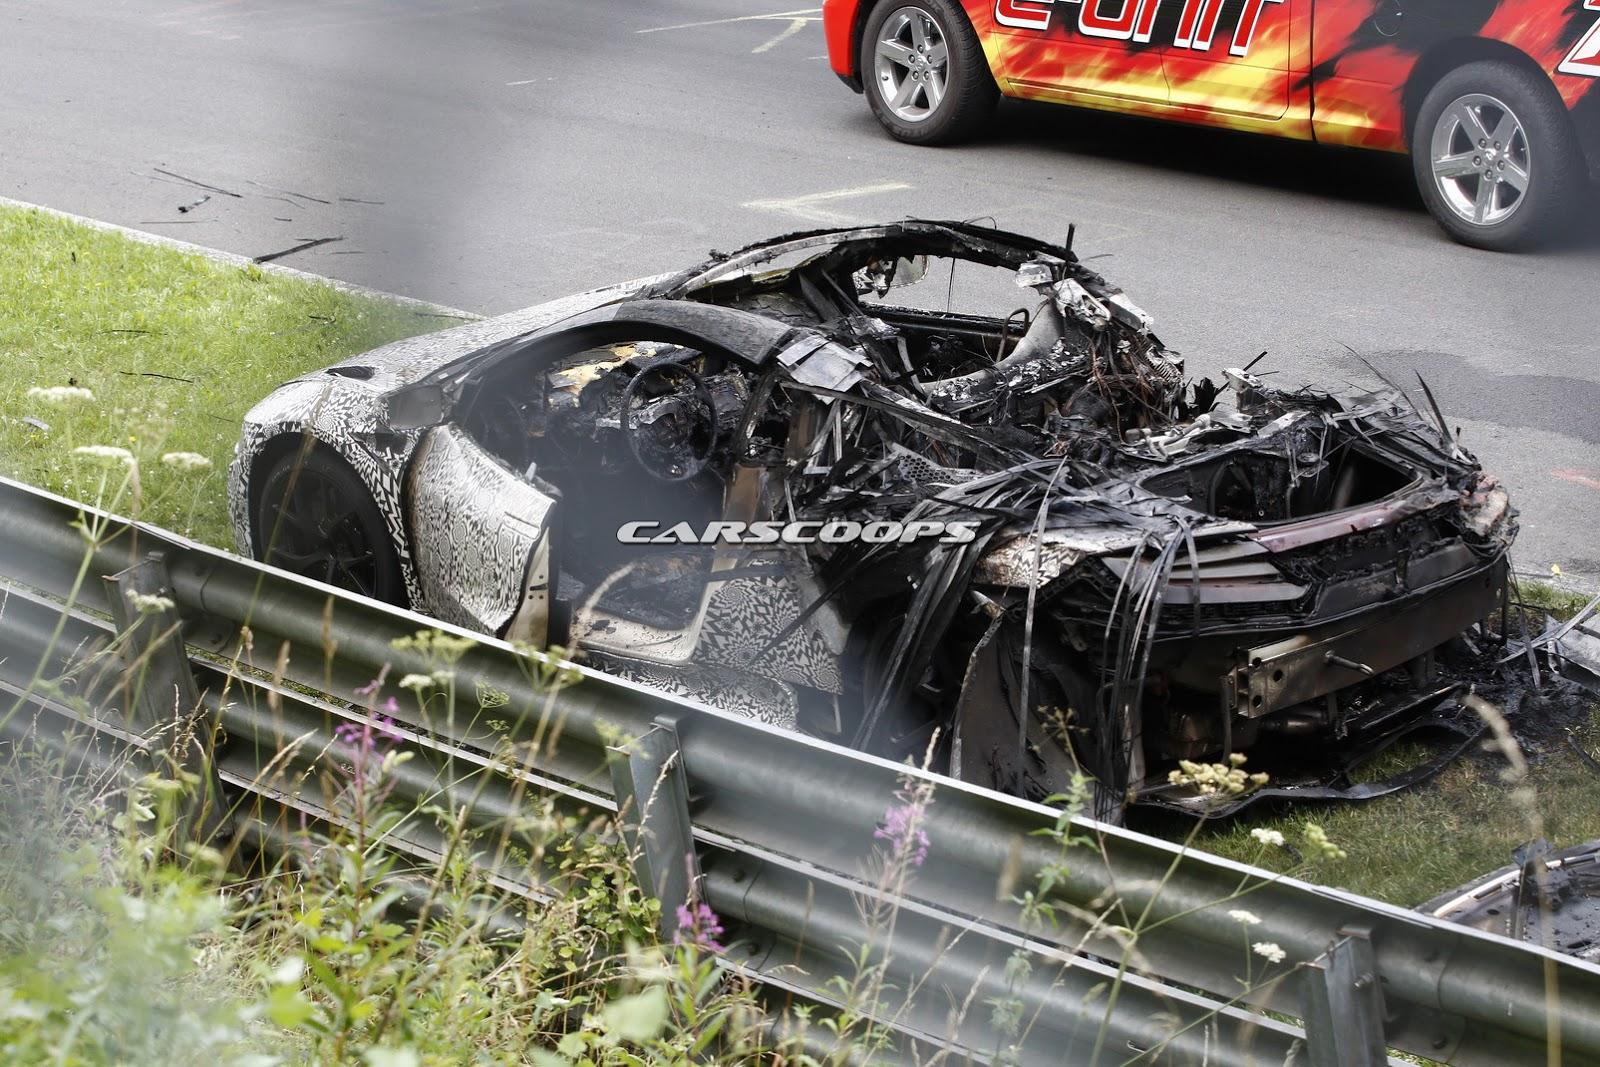 2016-Acura-Honda-NSX-Fire-2Carscoops.jpg